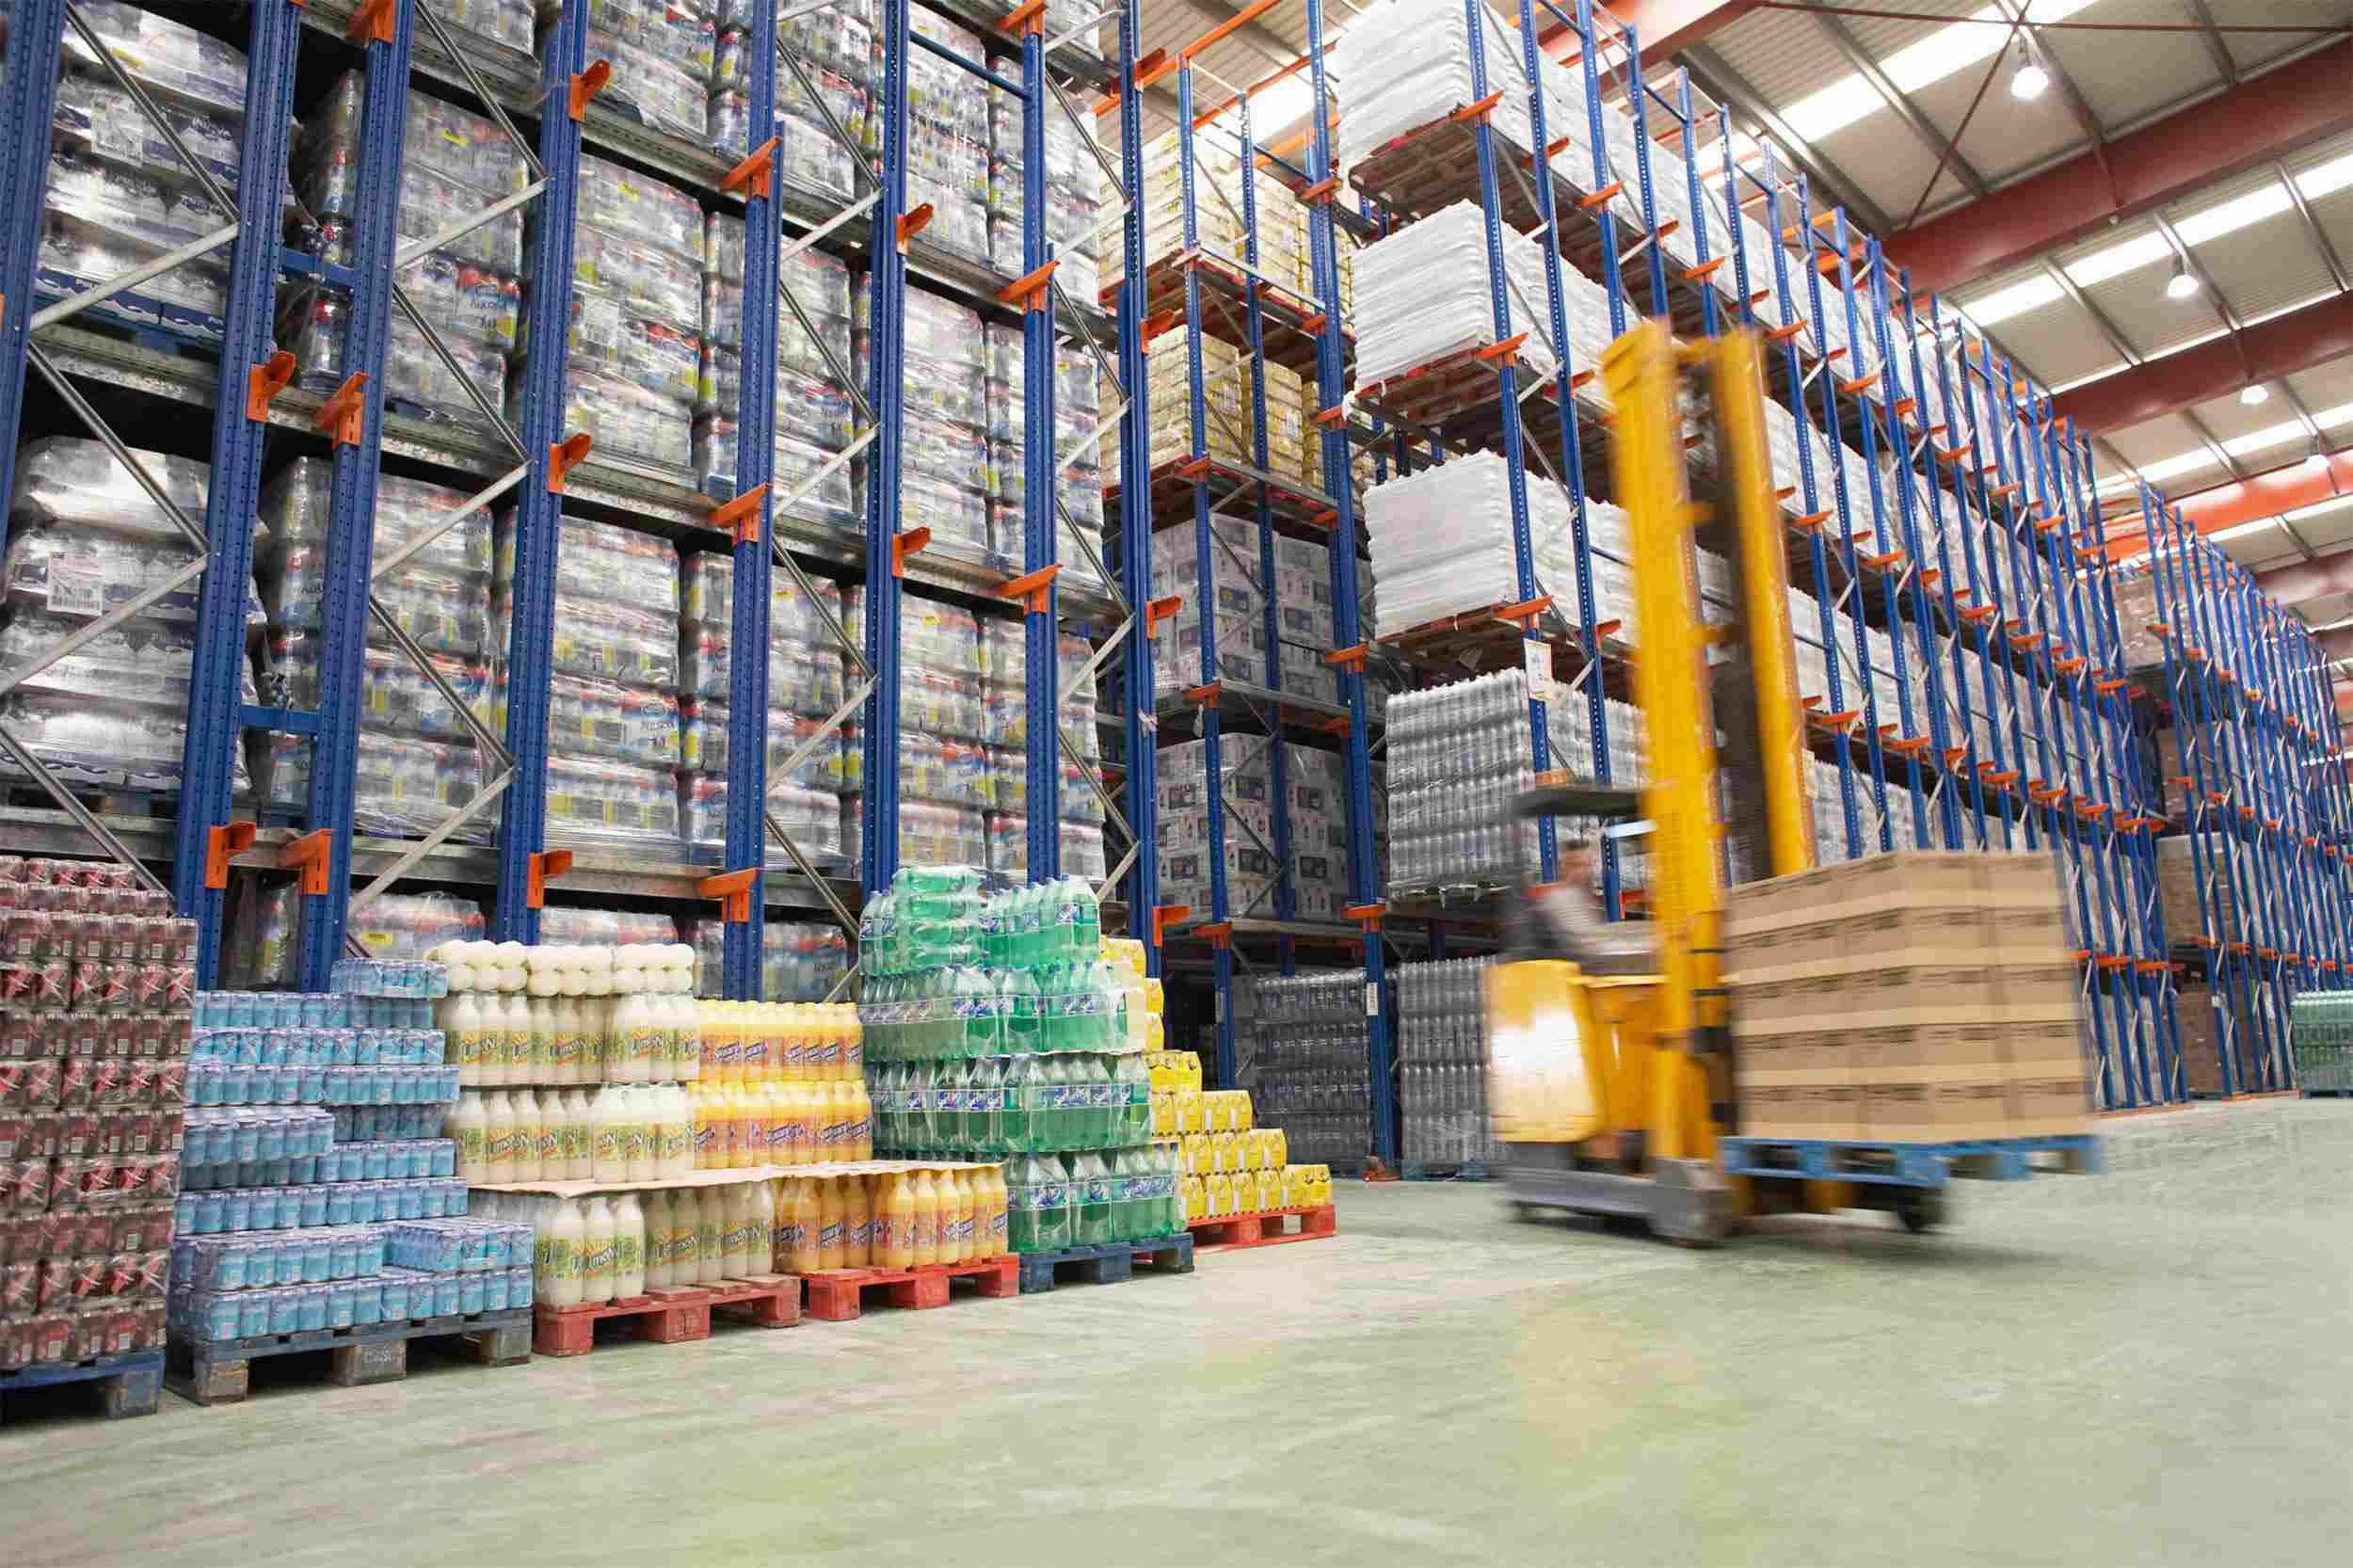 https://www.psz.sk/wp-content/uploads/2015/09/Warehouse-and-lifter1.jpg